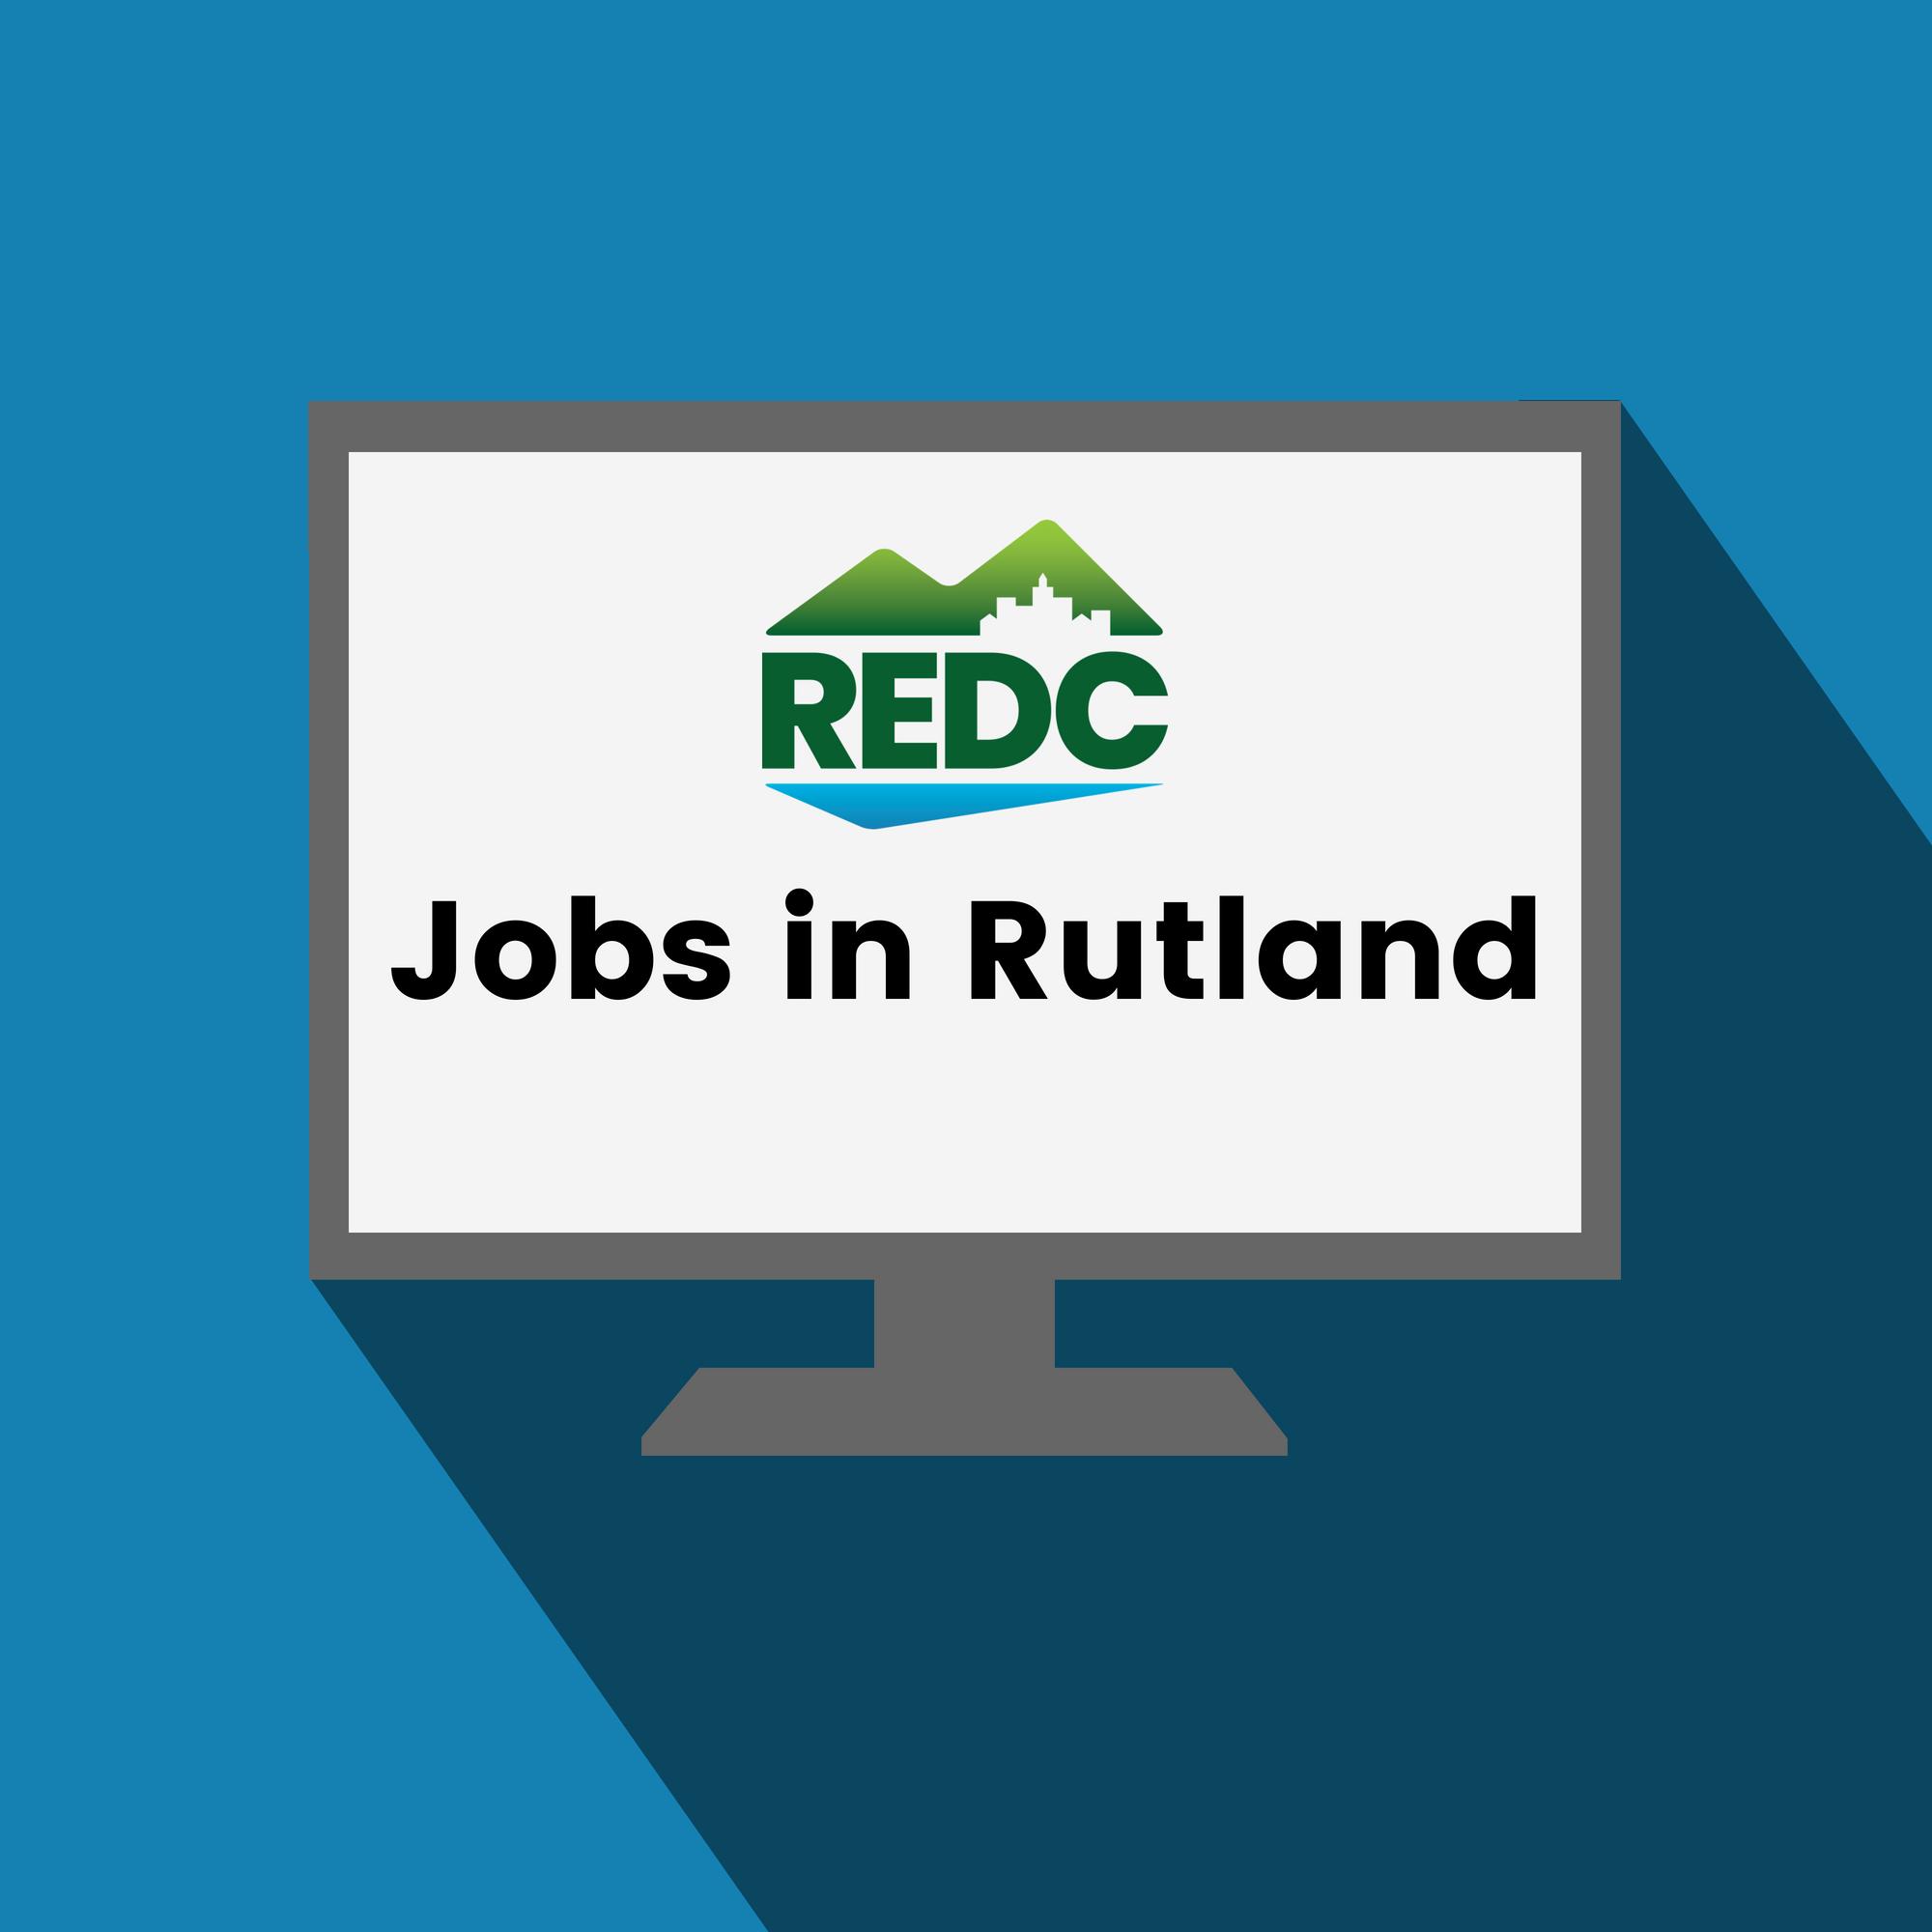 Rutland County Careers